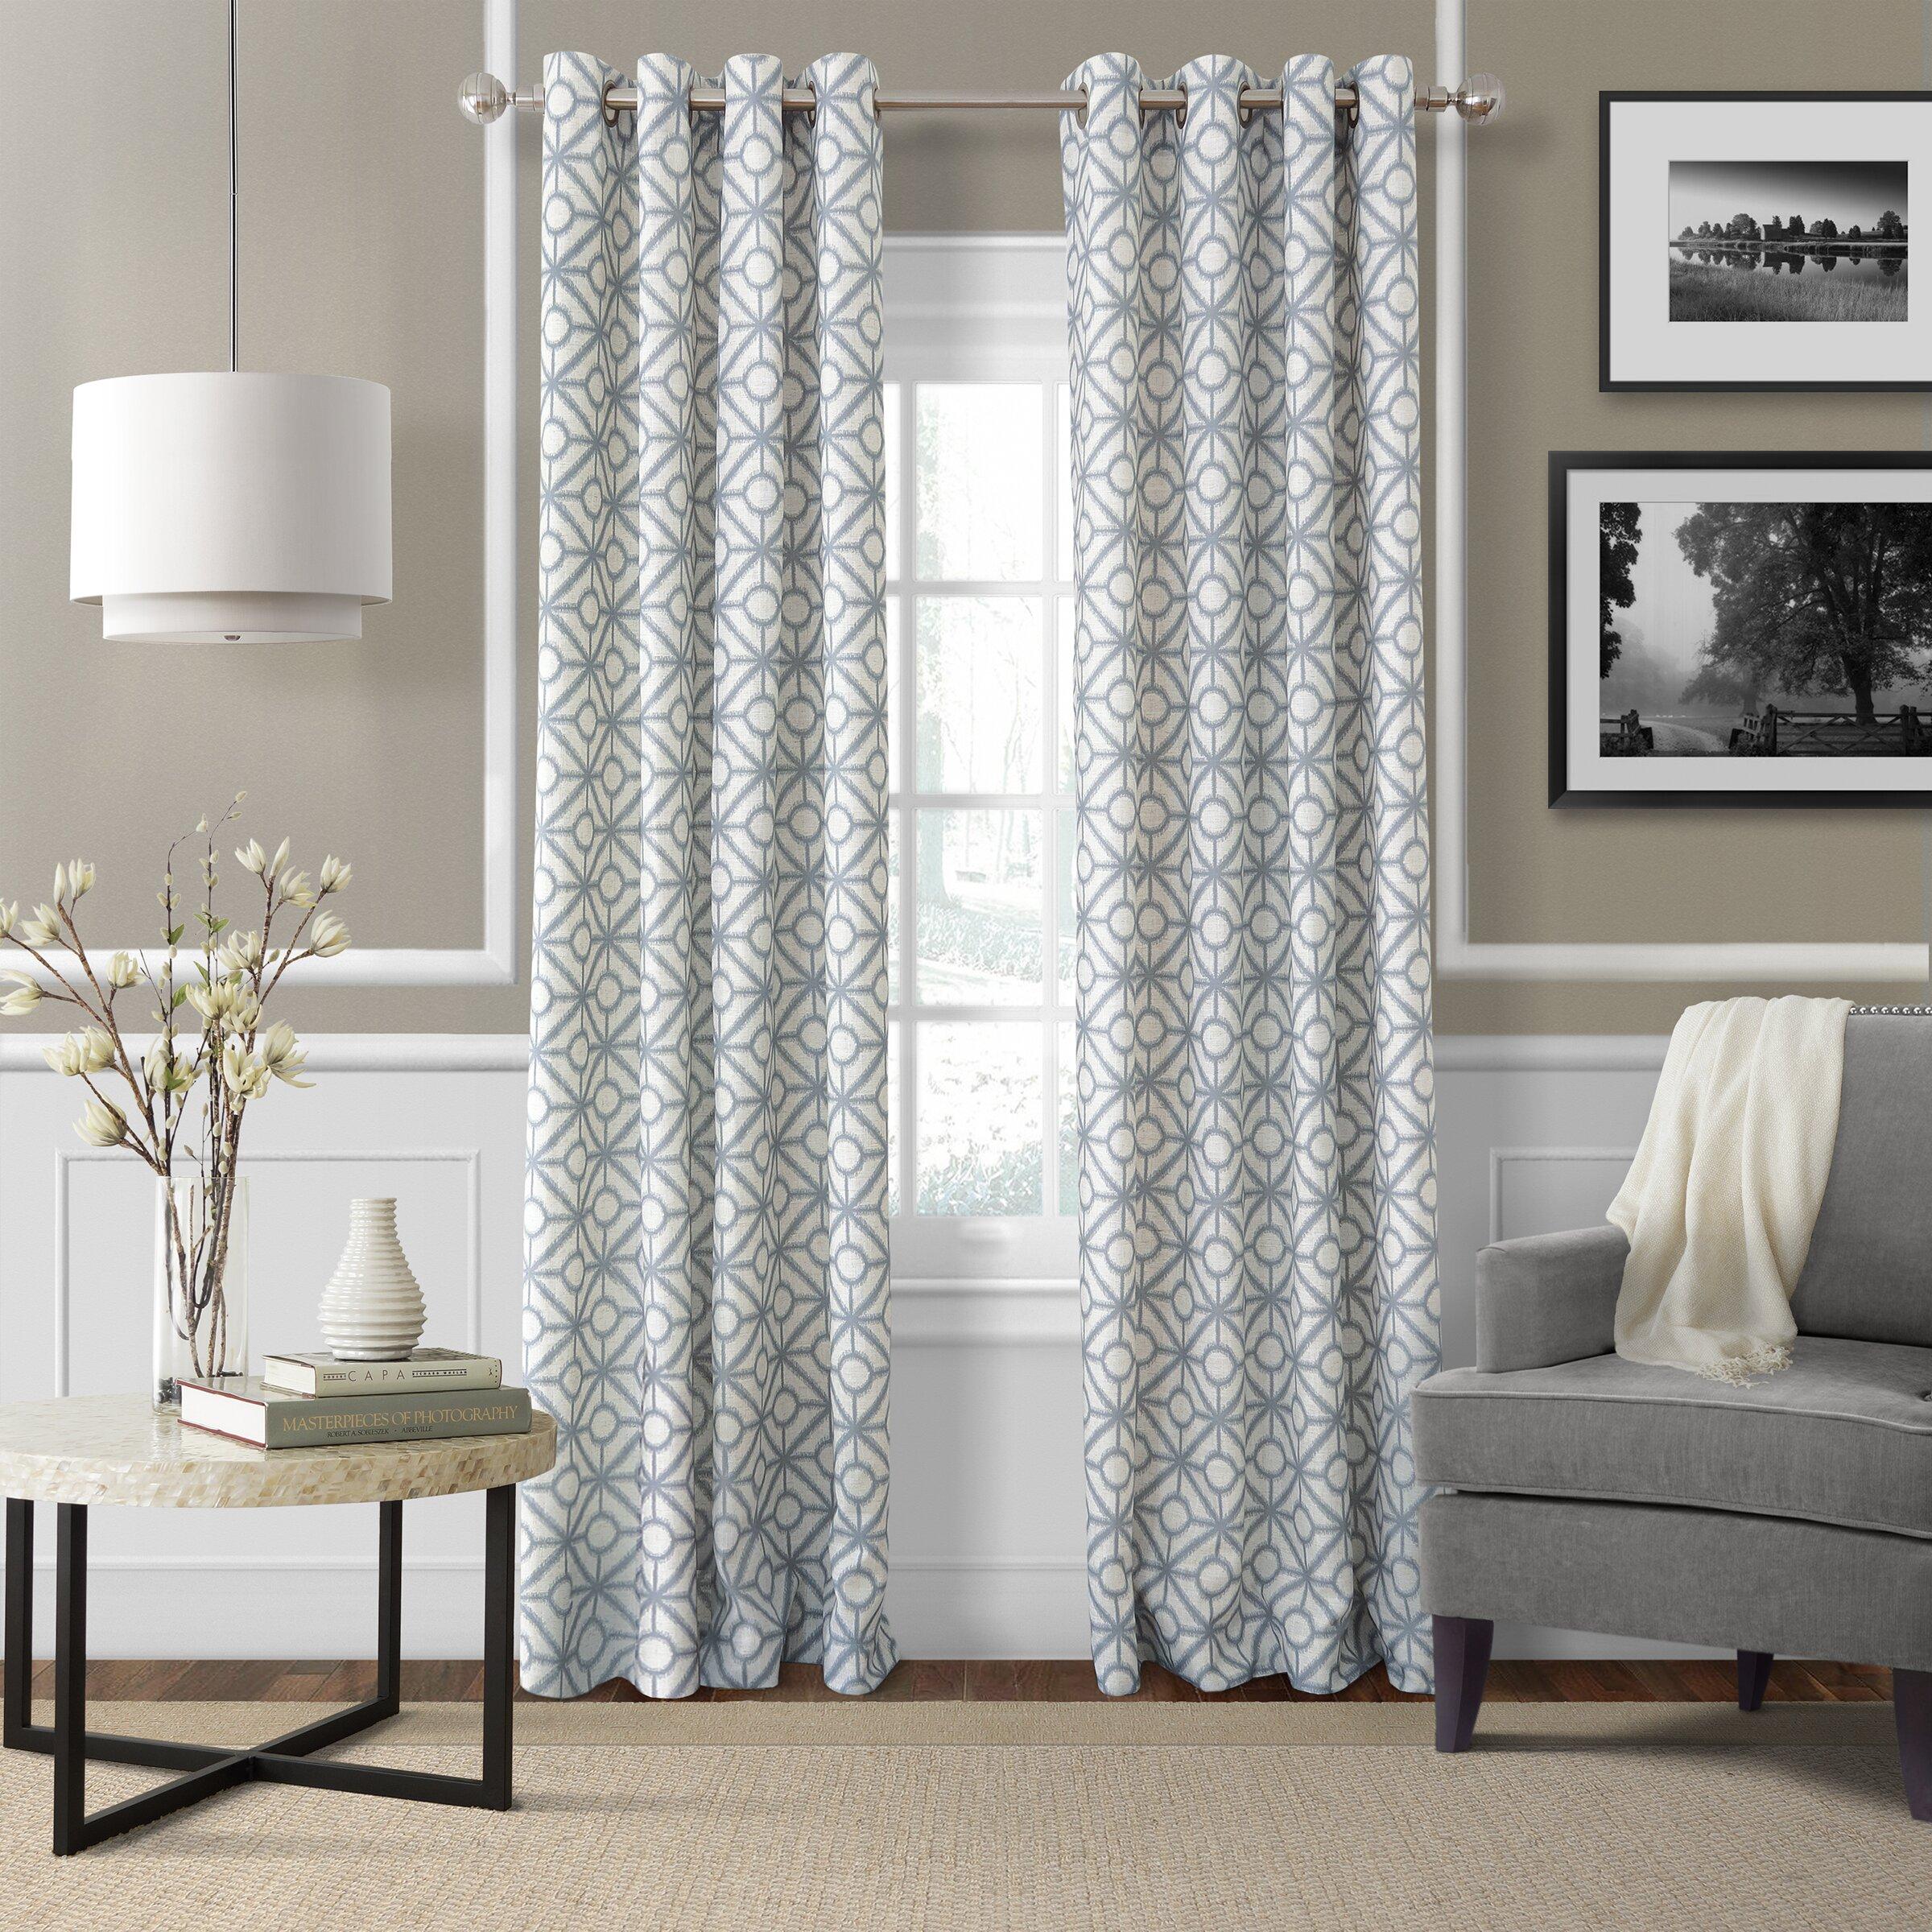 Elrene Home Fashions Crackle Single Curtain Panel